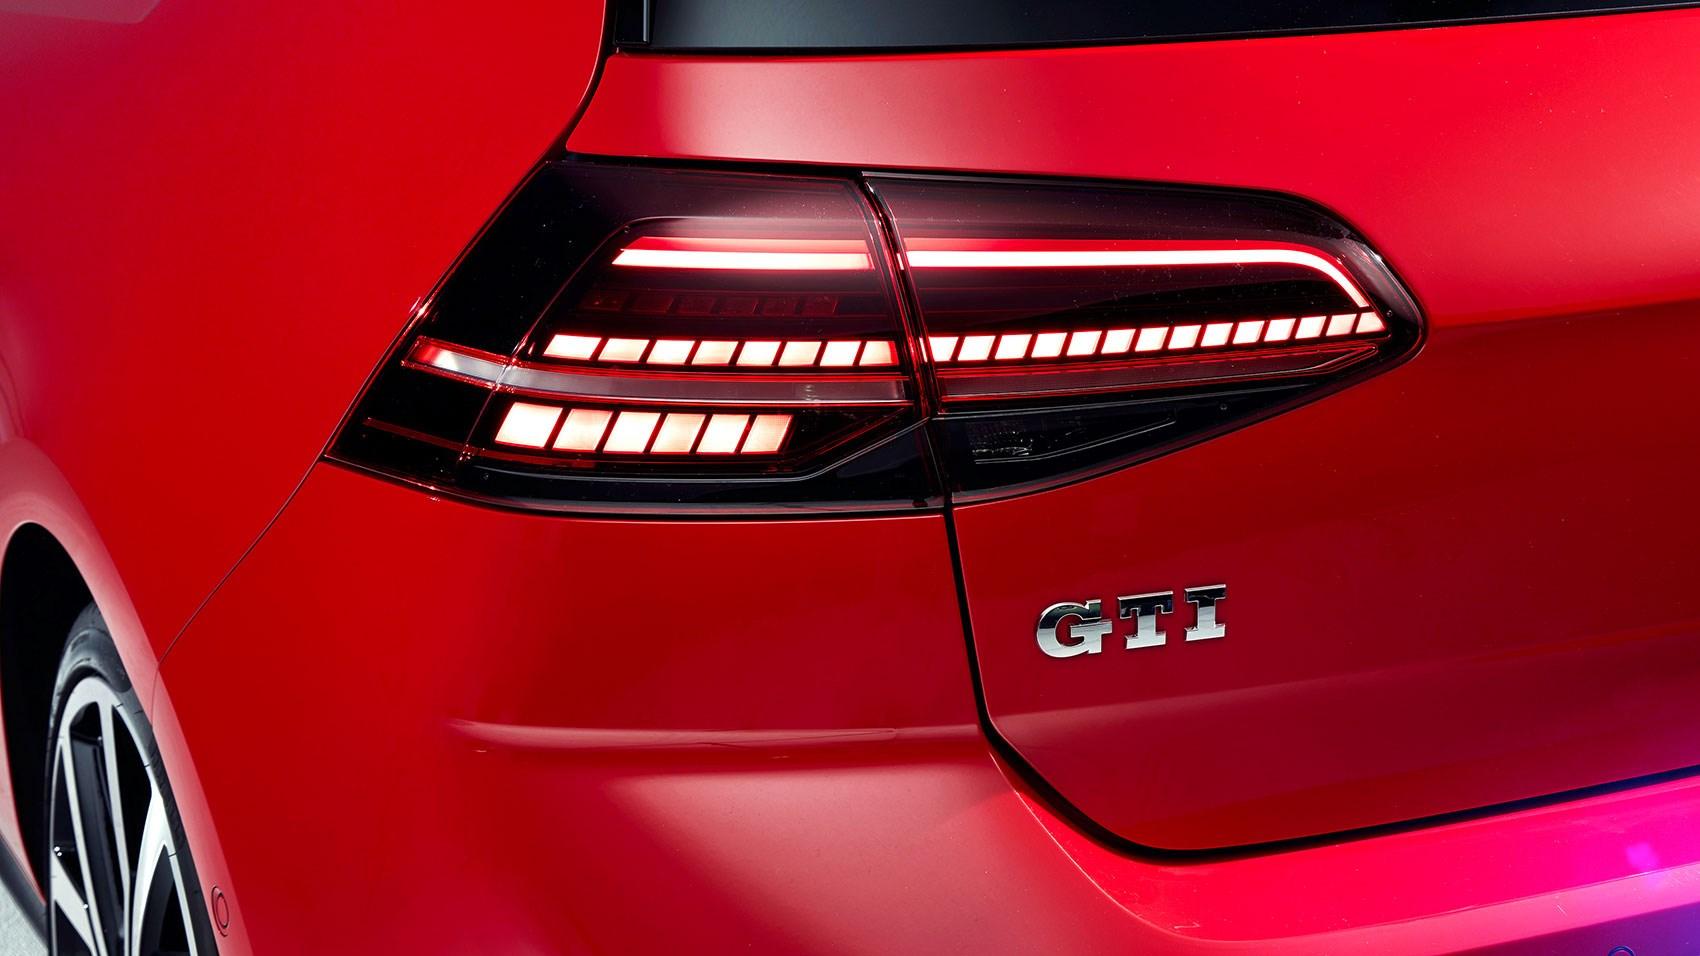 Vw Lease Deals >> VW Golf GTI 2017 Mk7 facelift review | CAR Magazine